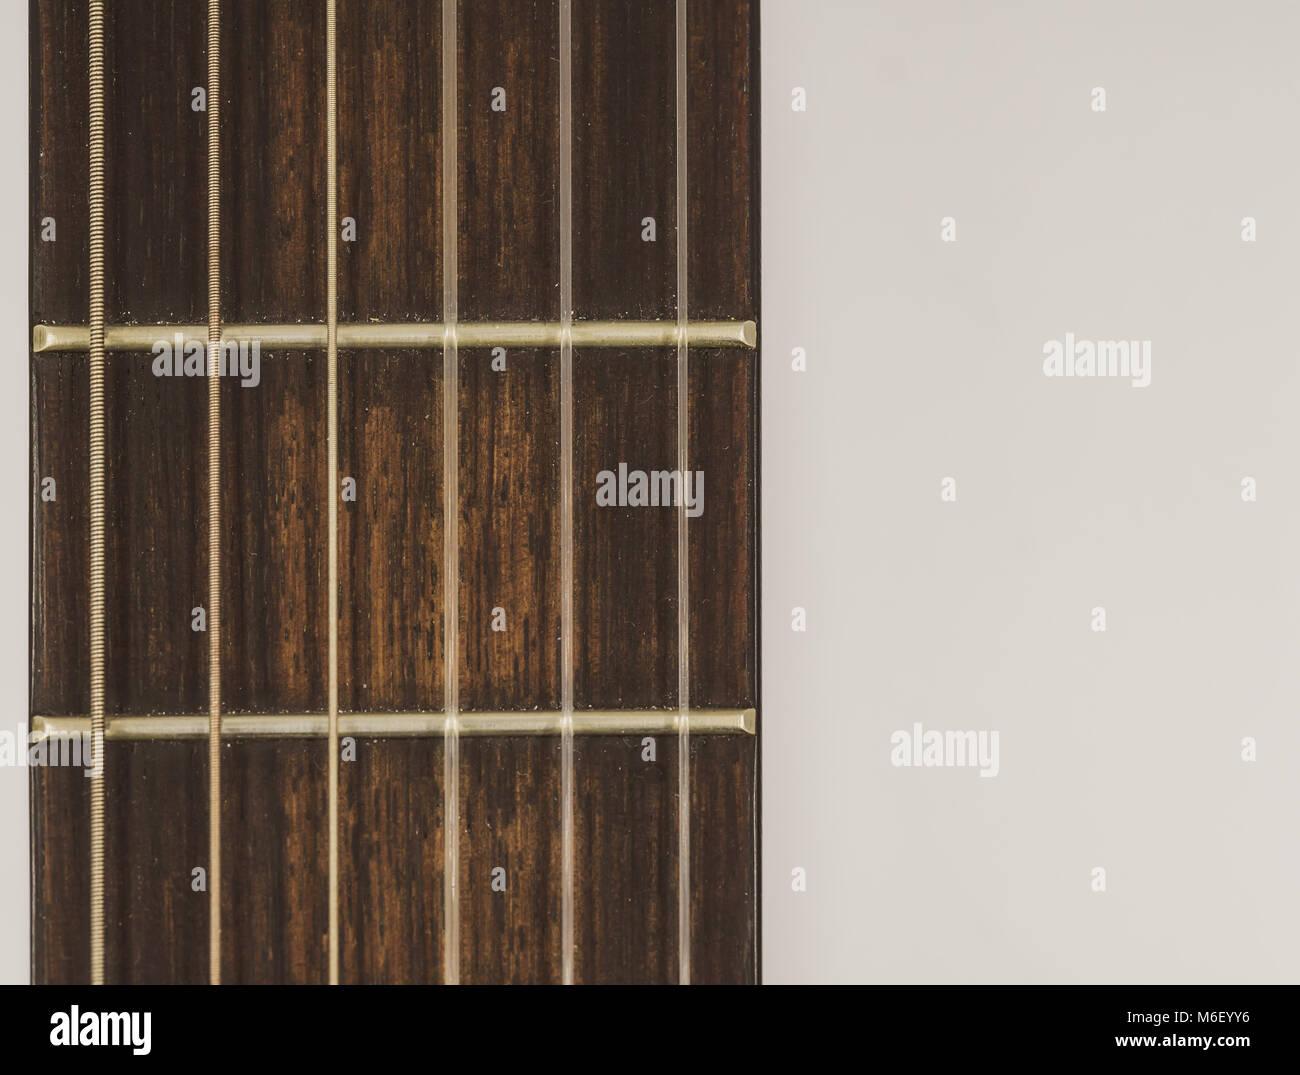 Nylon & steel strung spanish guitar neck isolated on white background - Stock Image